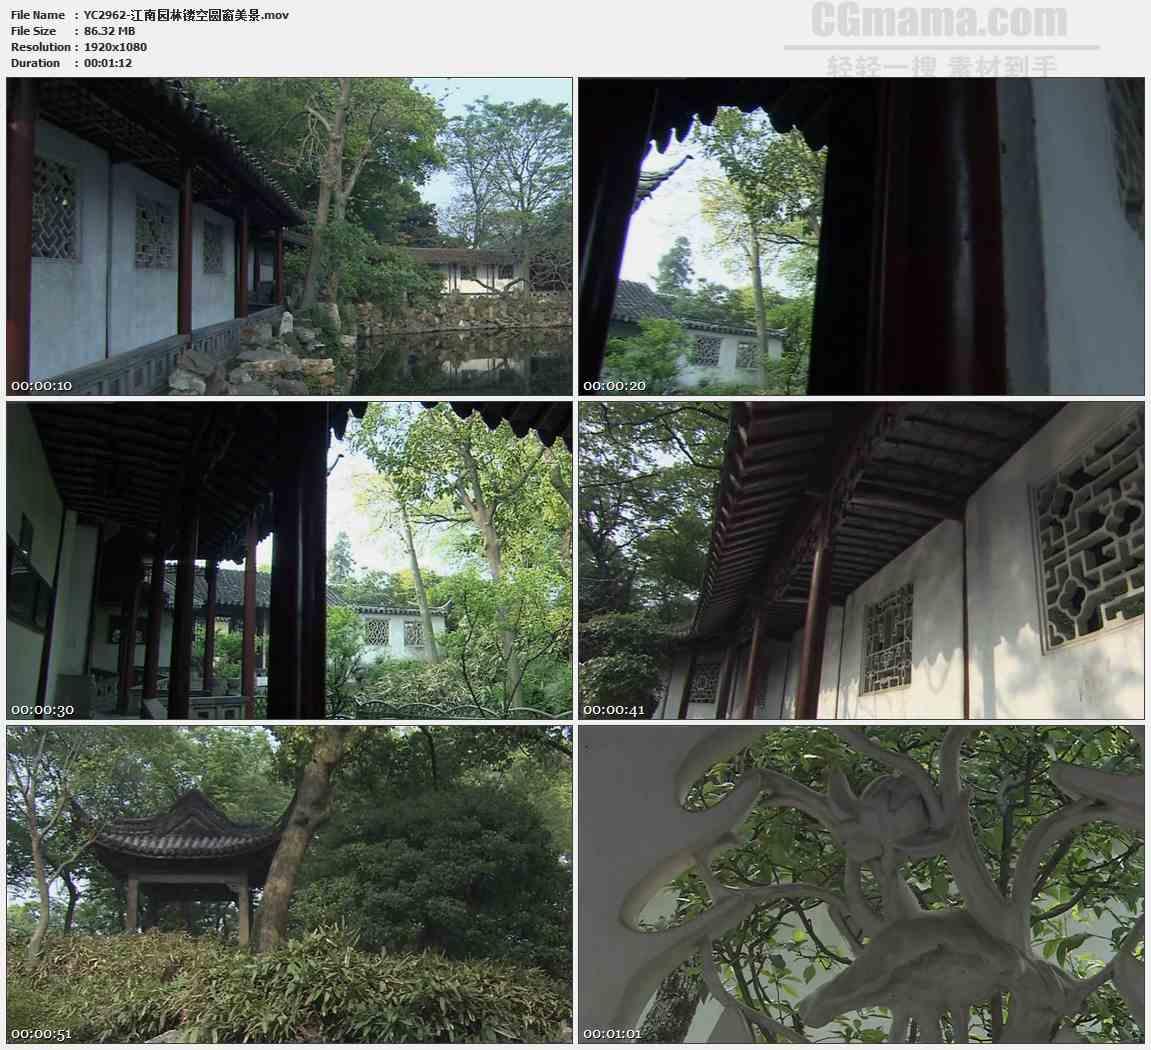 YC2962-江南园林镂空圆窗美景高清实拍视频素材